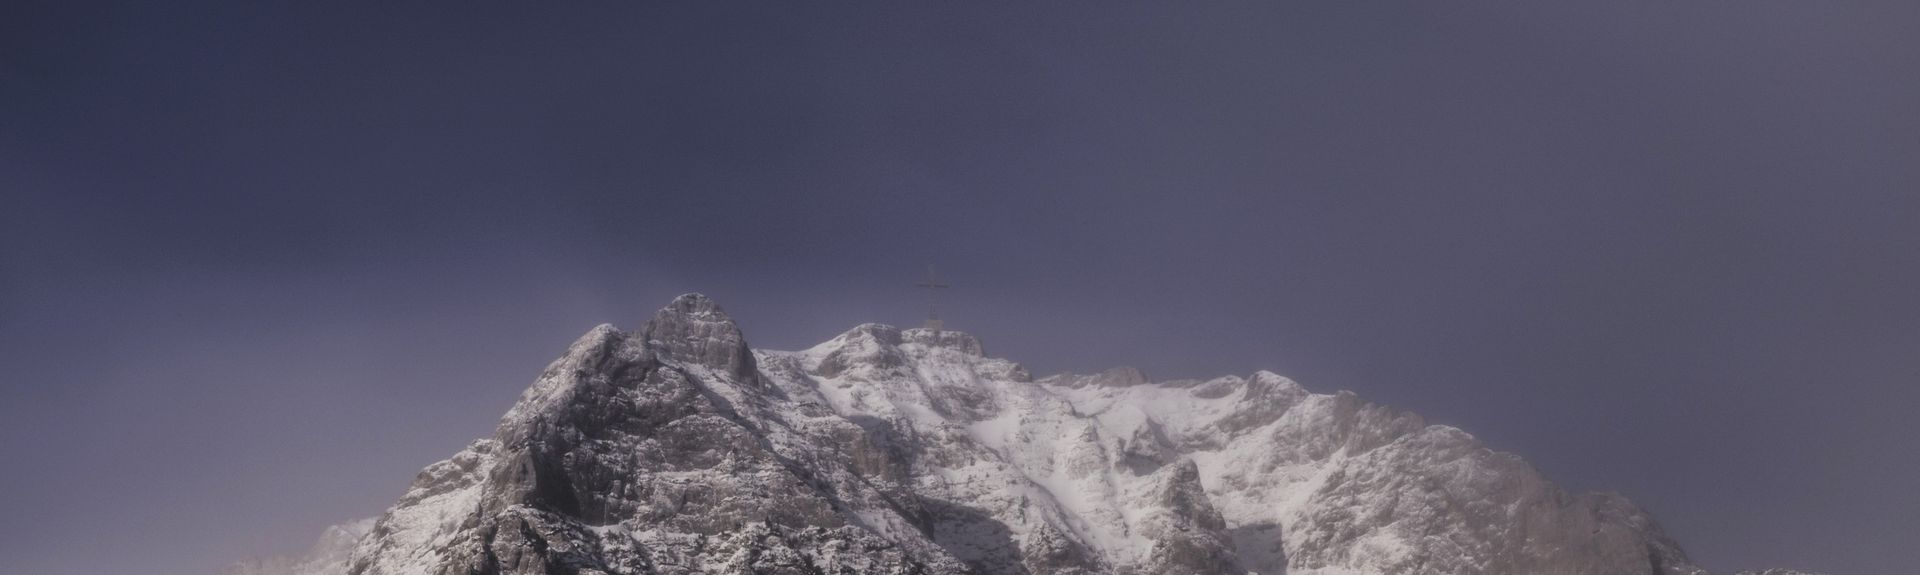 Skigebiet Poiana Brașov, Rasnov, Centru, Rumänien